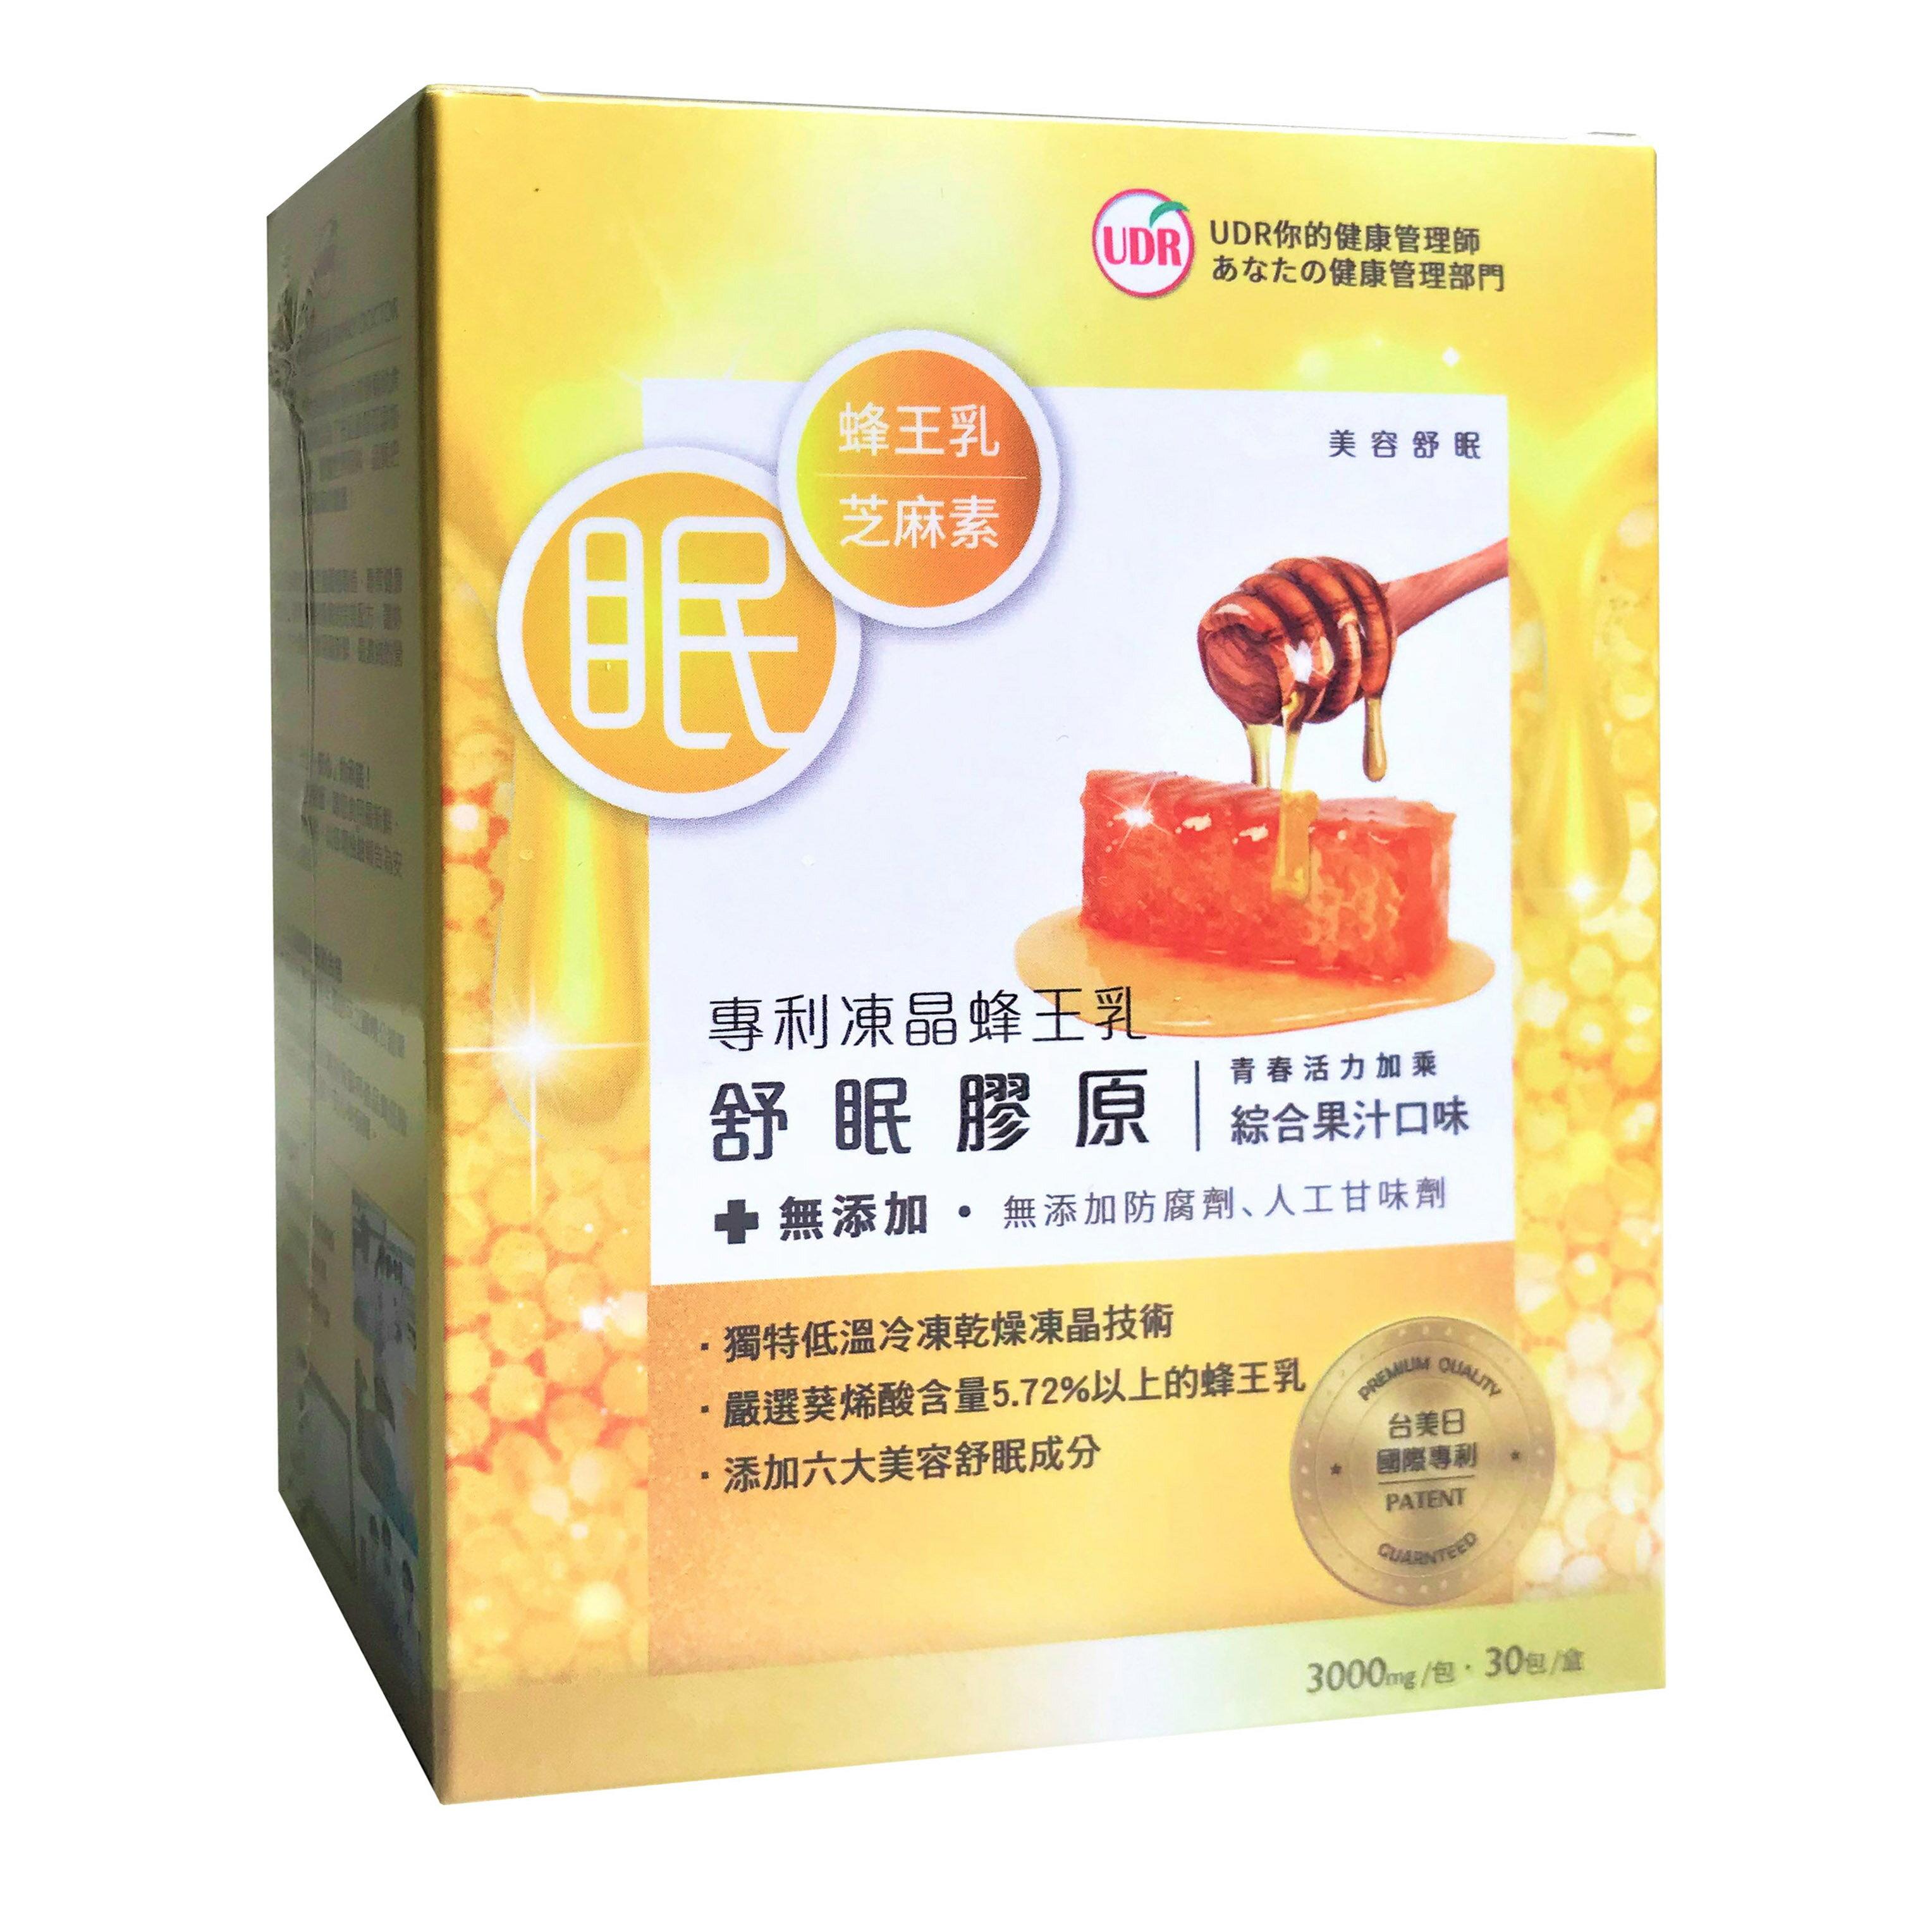 UDR 專利凍晶蜂王乳舒眠膠原(30包 / 盒)【優.日常】 - 限時優惠好康折扣